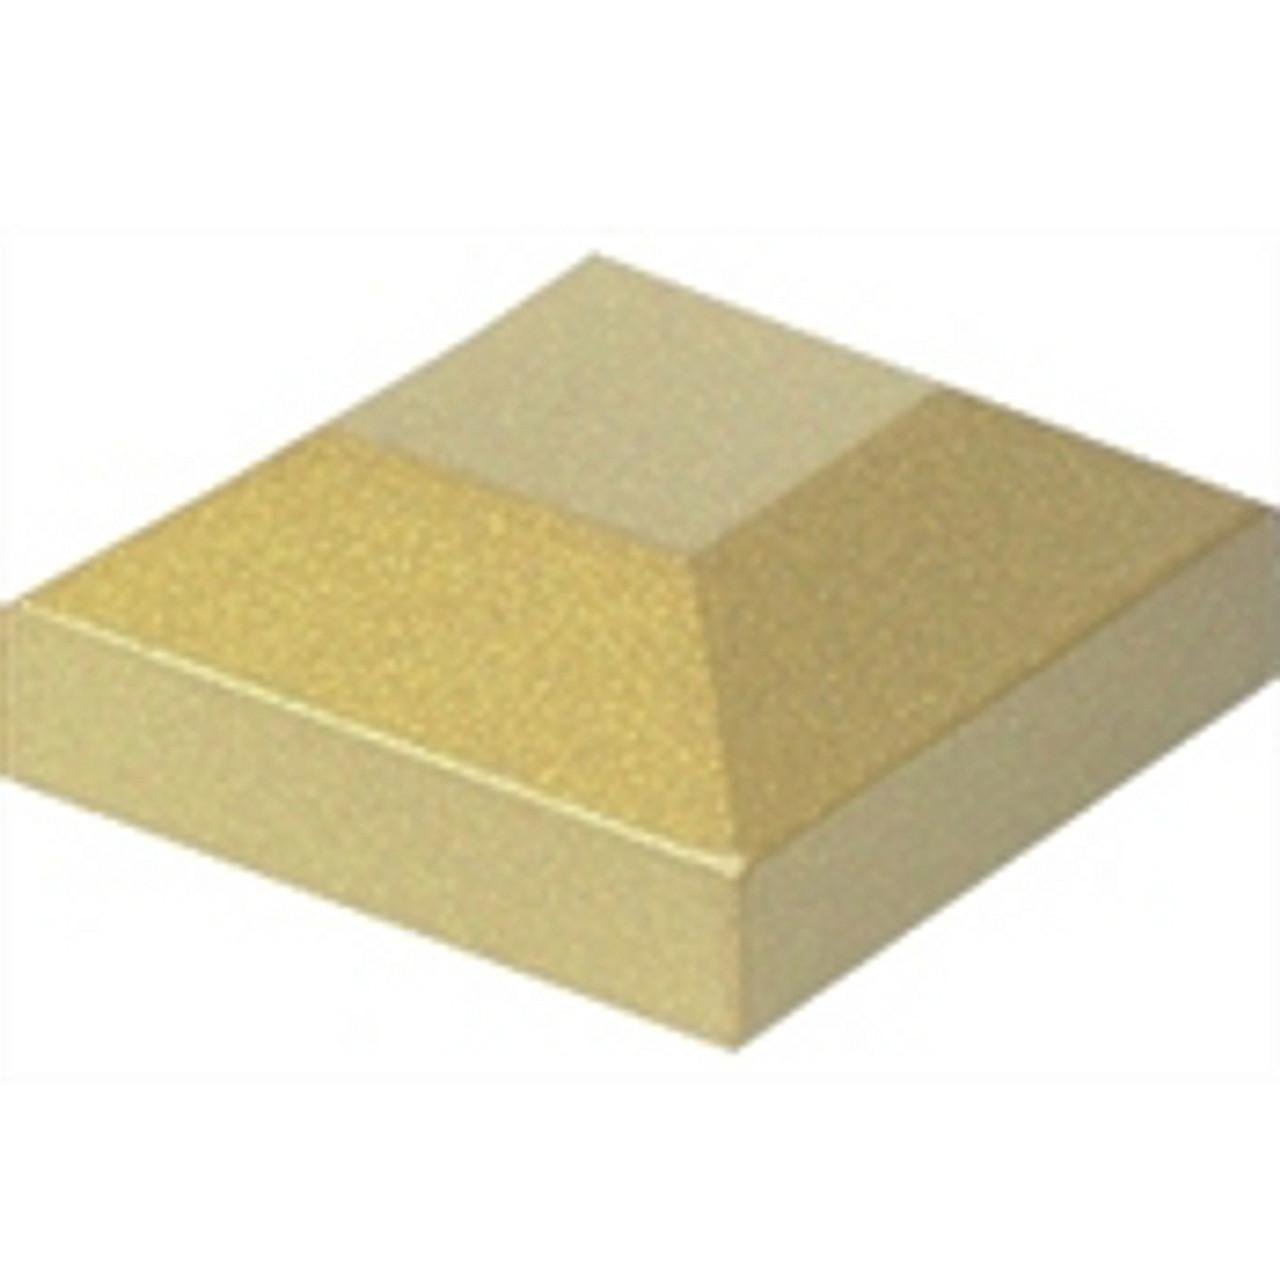 "Regis 2"" Aluminum Flat Post Caps - Available in 12 Colors"